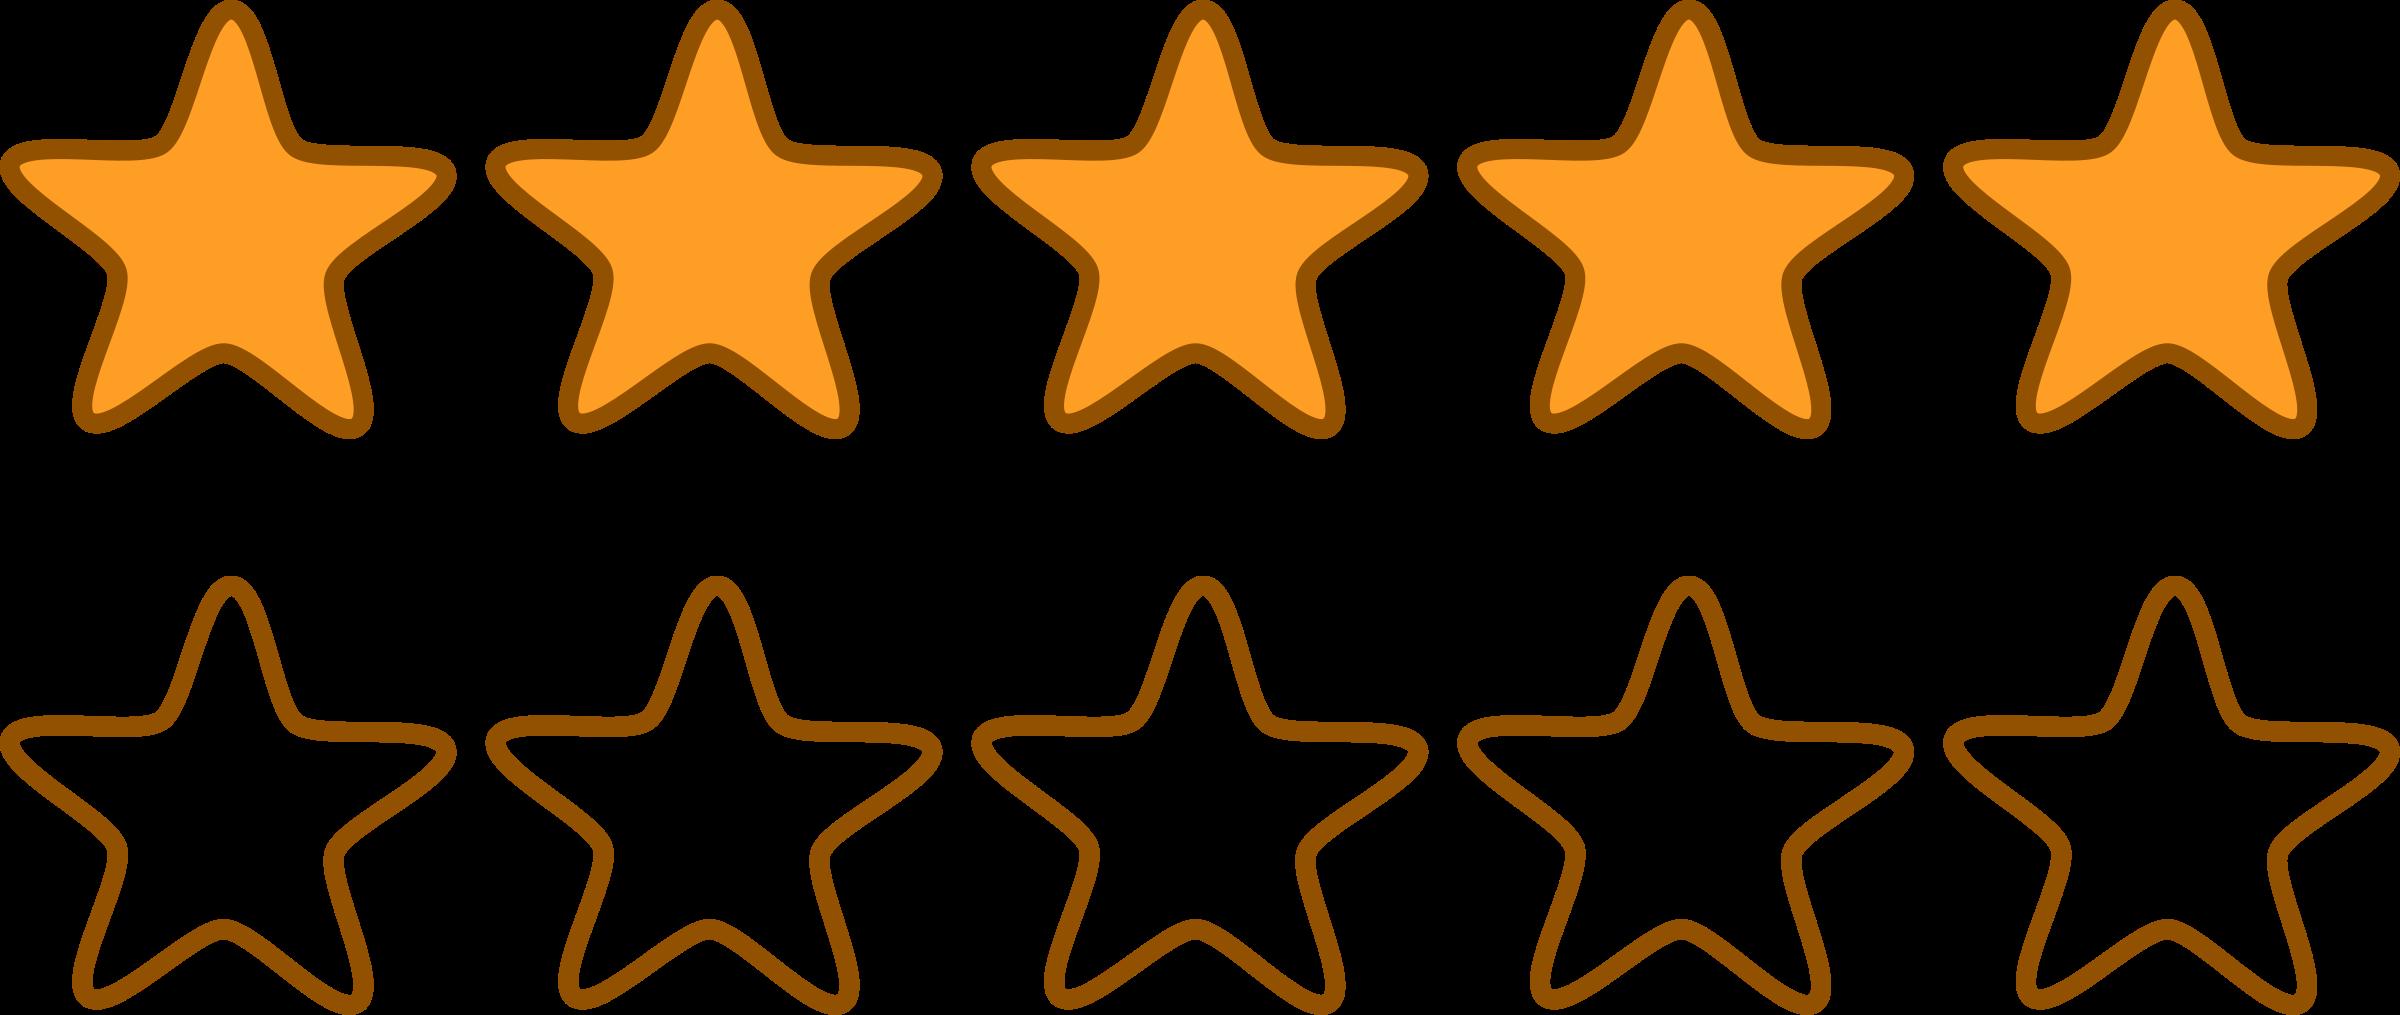 Star rating clipart clip art free stock Clipart - Stars clip art free stock